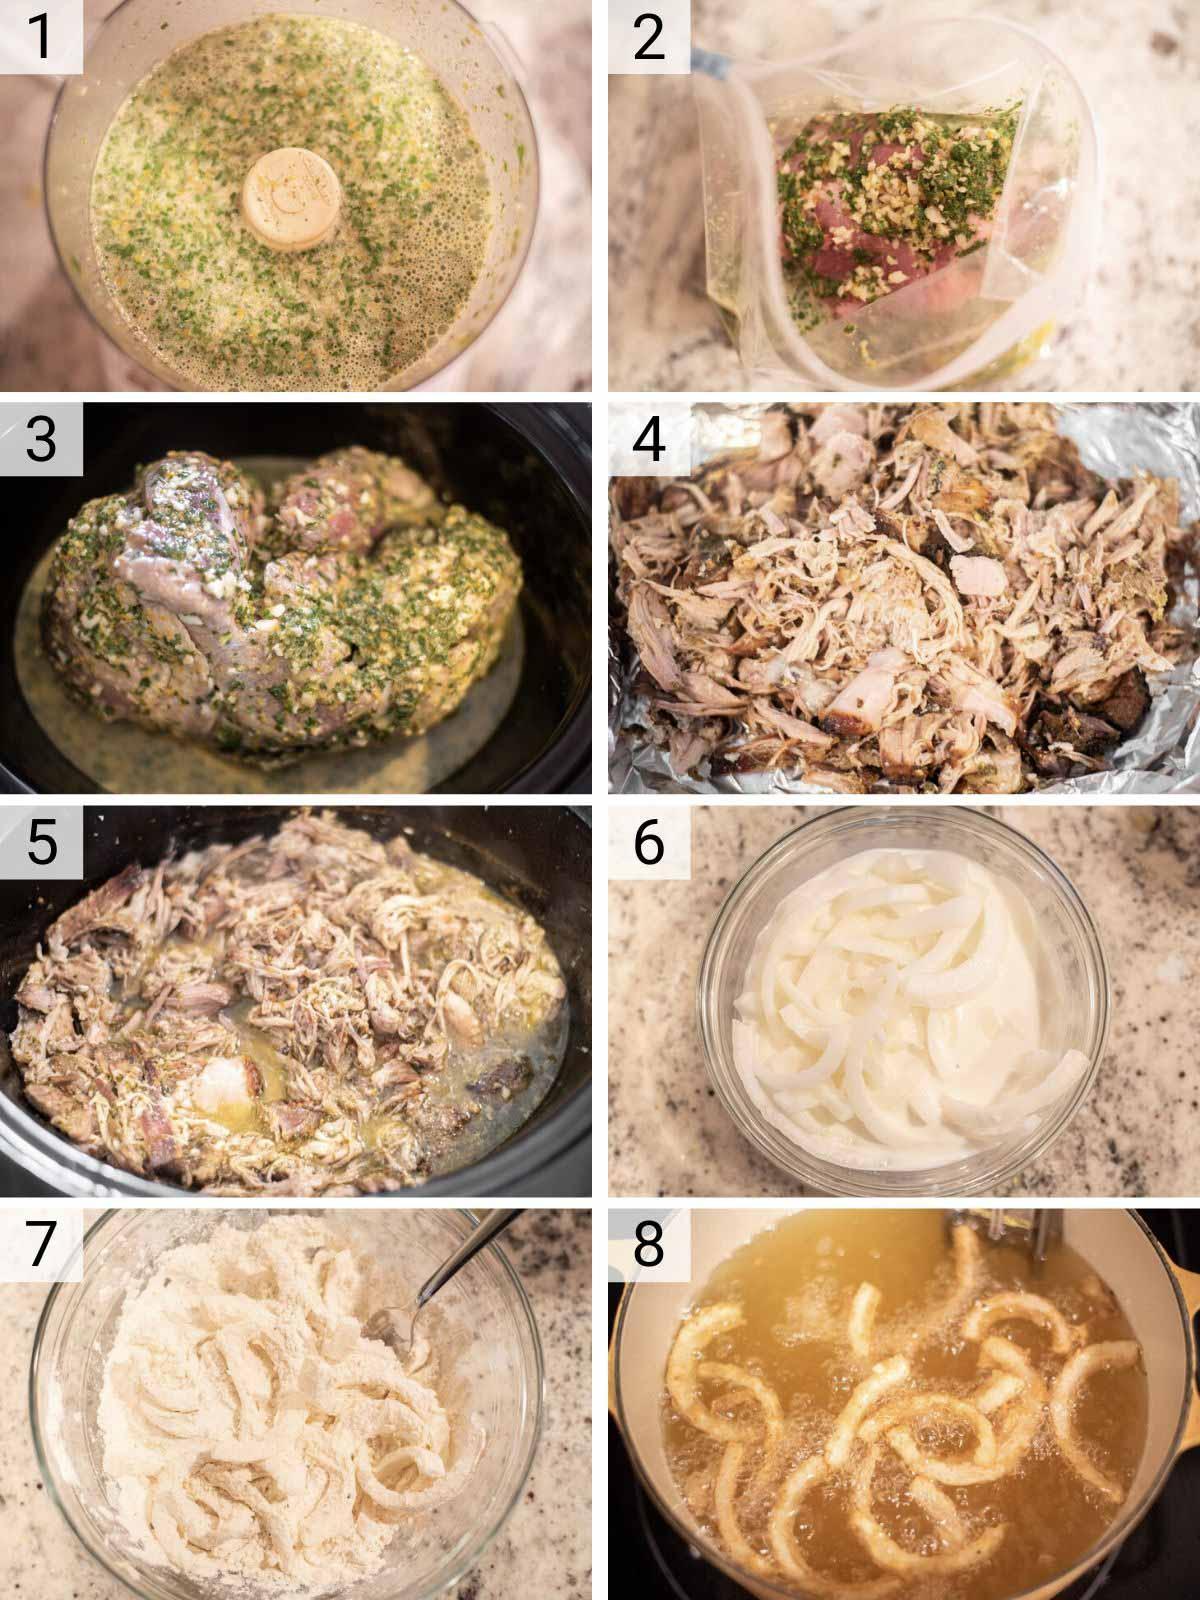 process shots of how to make mojo pork tacos